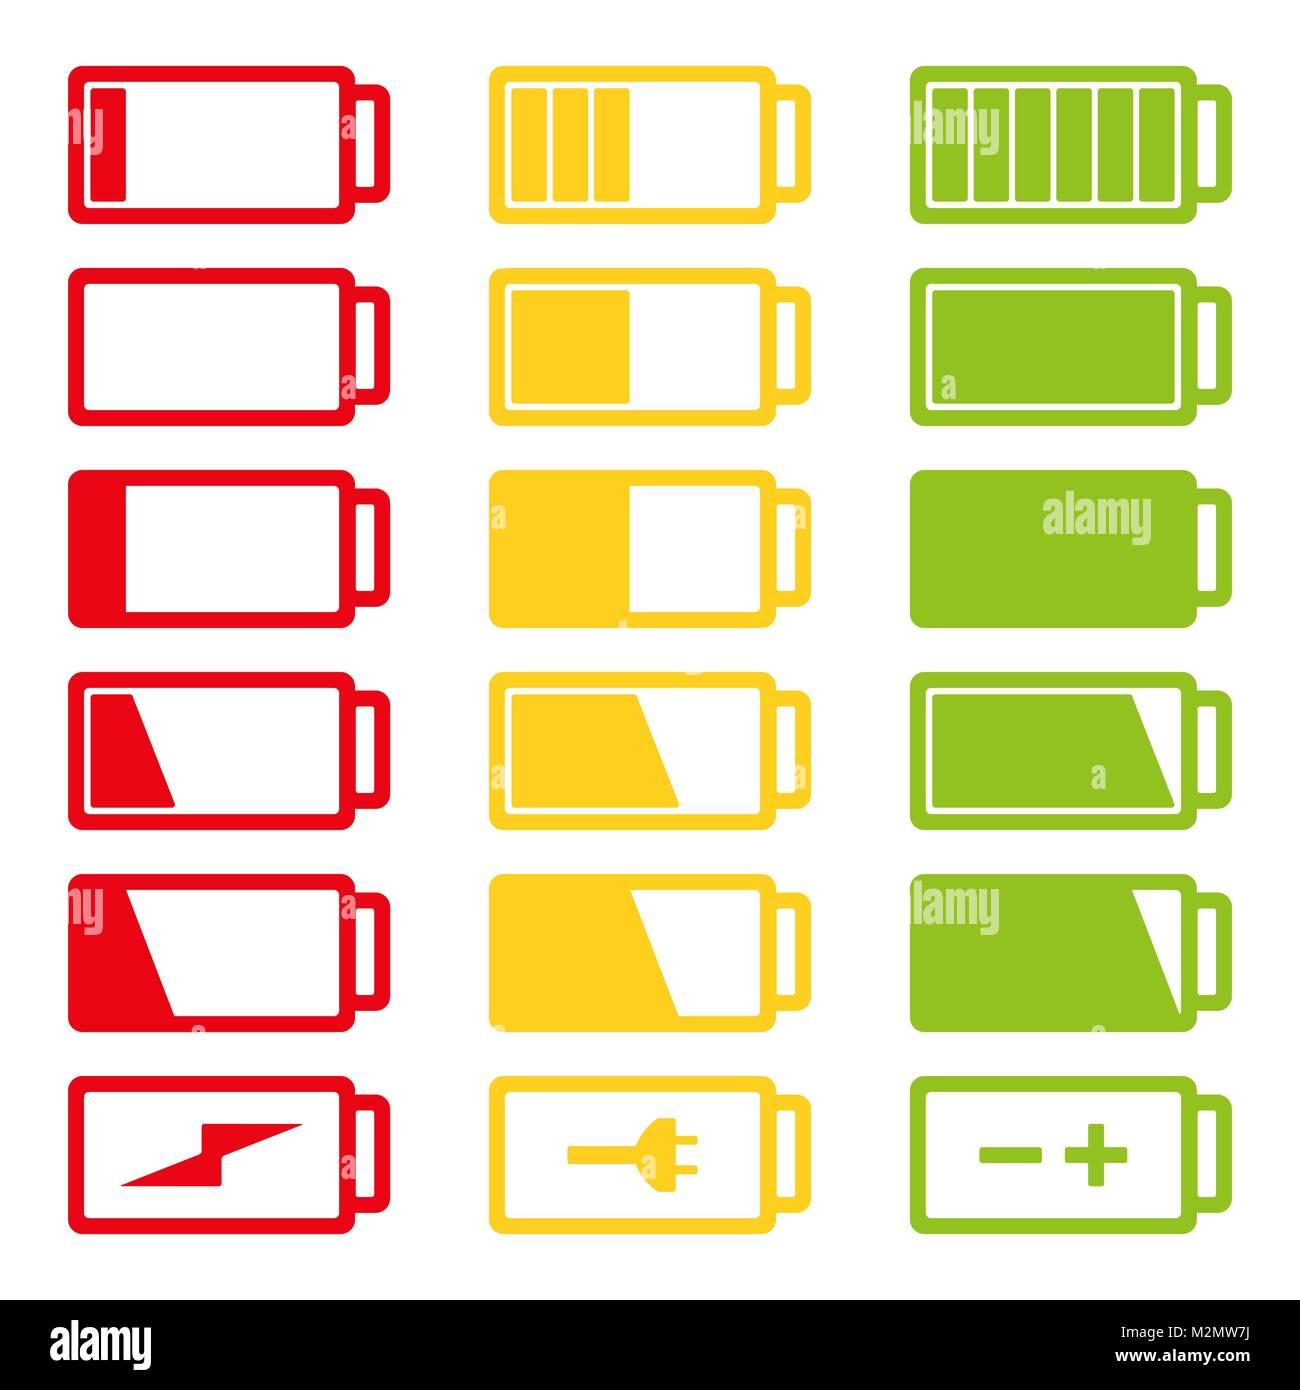 Battery flat icon set vector illustration isolated on white background eps10. Symbols of battery charge level, full - Stock Vector